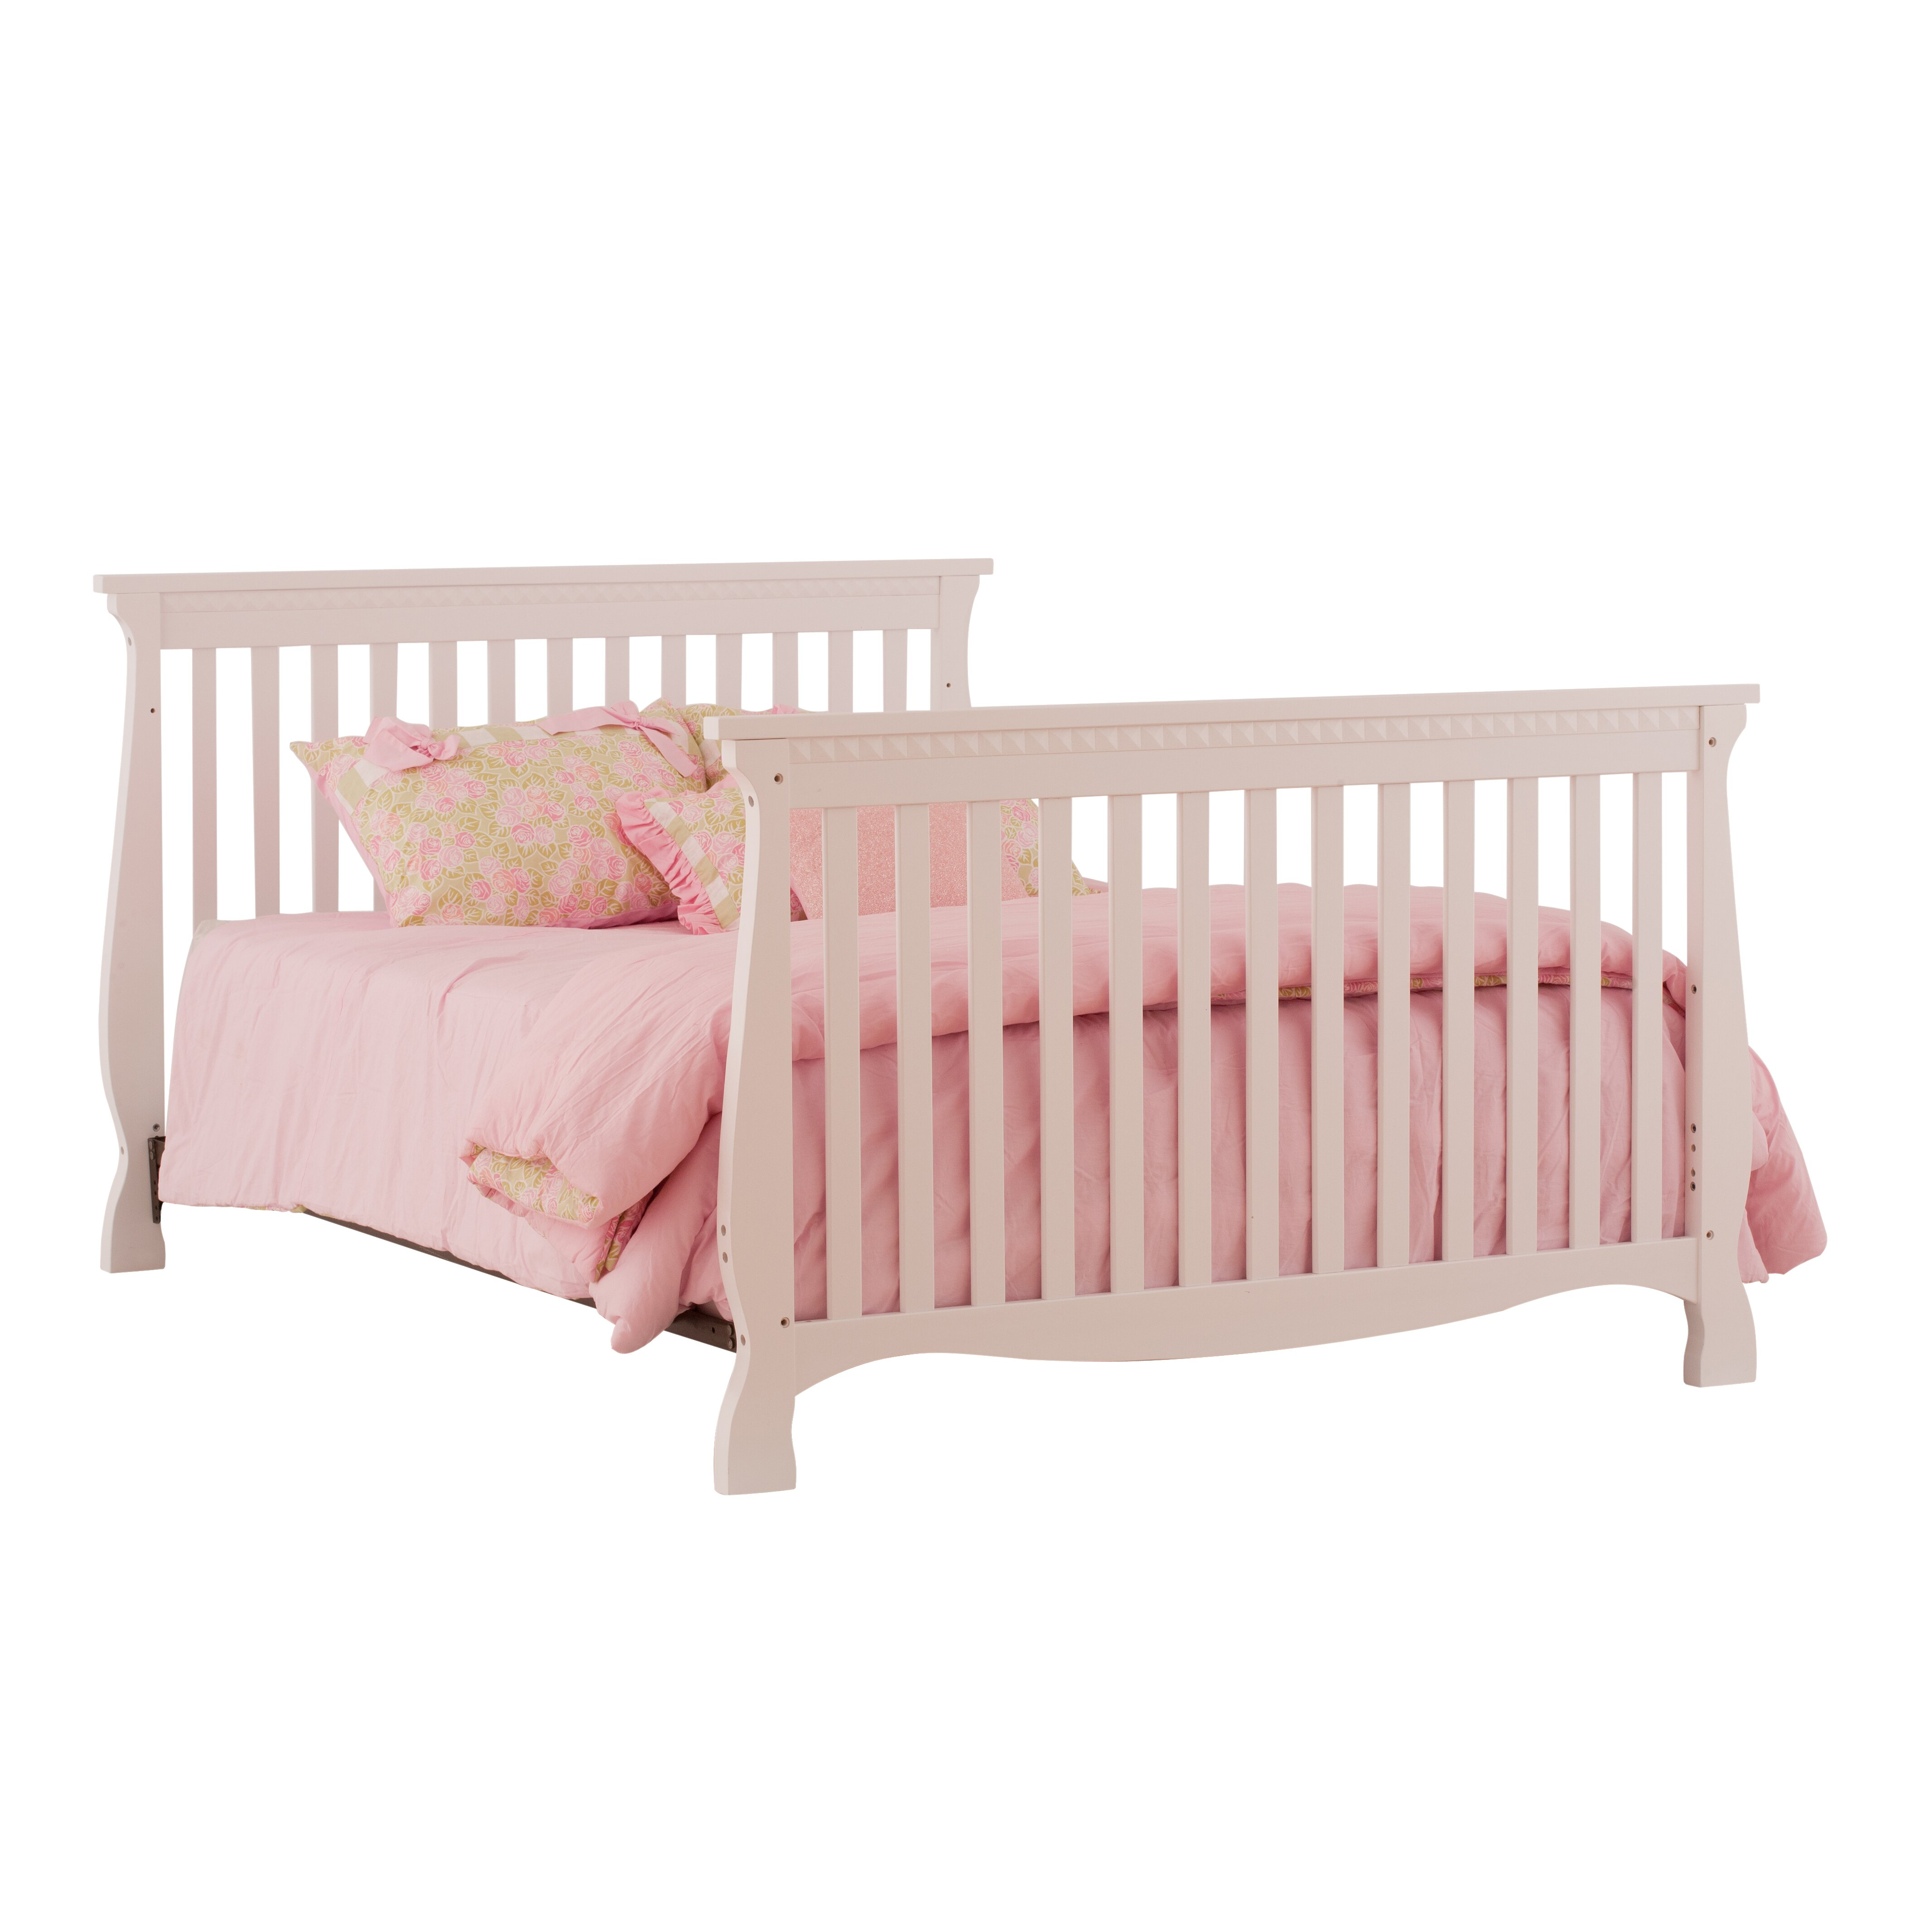 Crib for sale louisville ky - Storkcraft Venetian 4 In 1 Convertible Crib